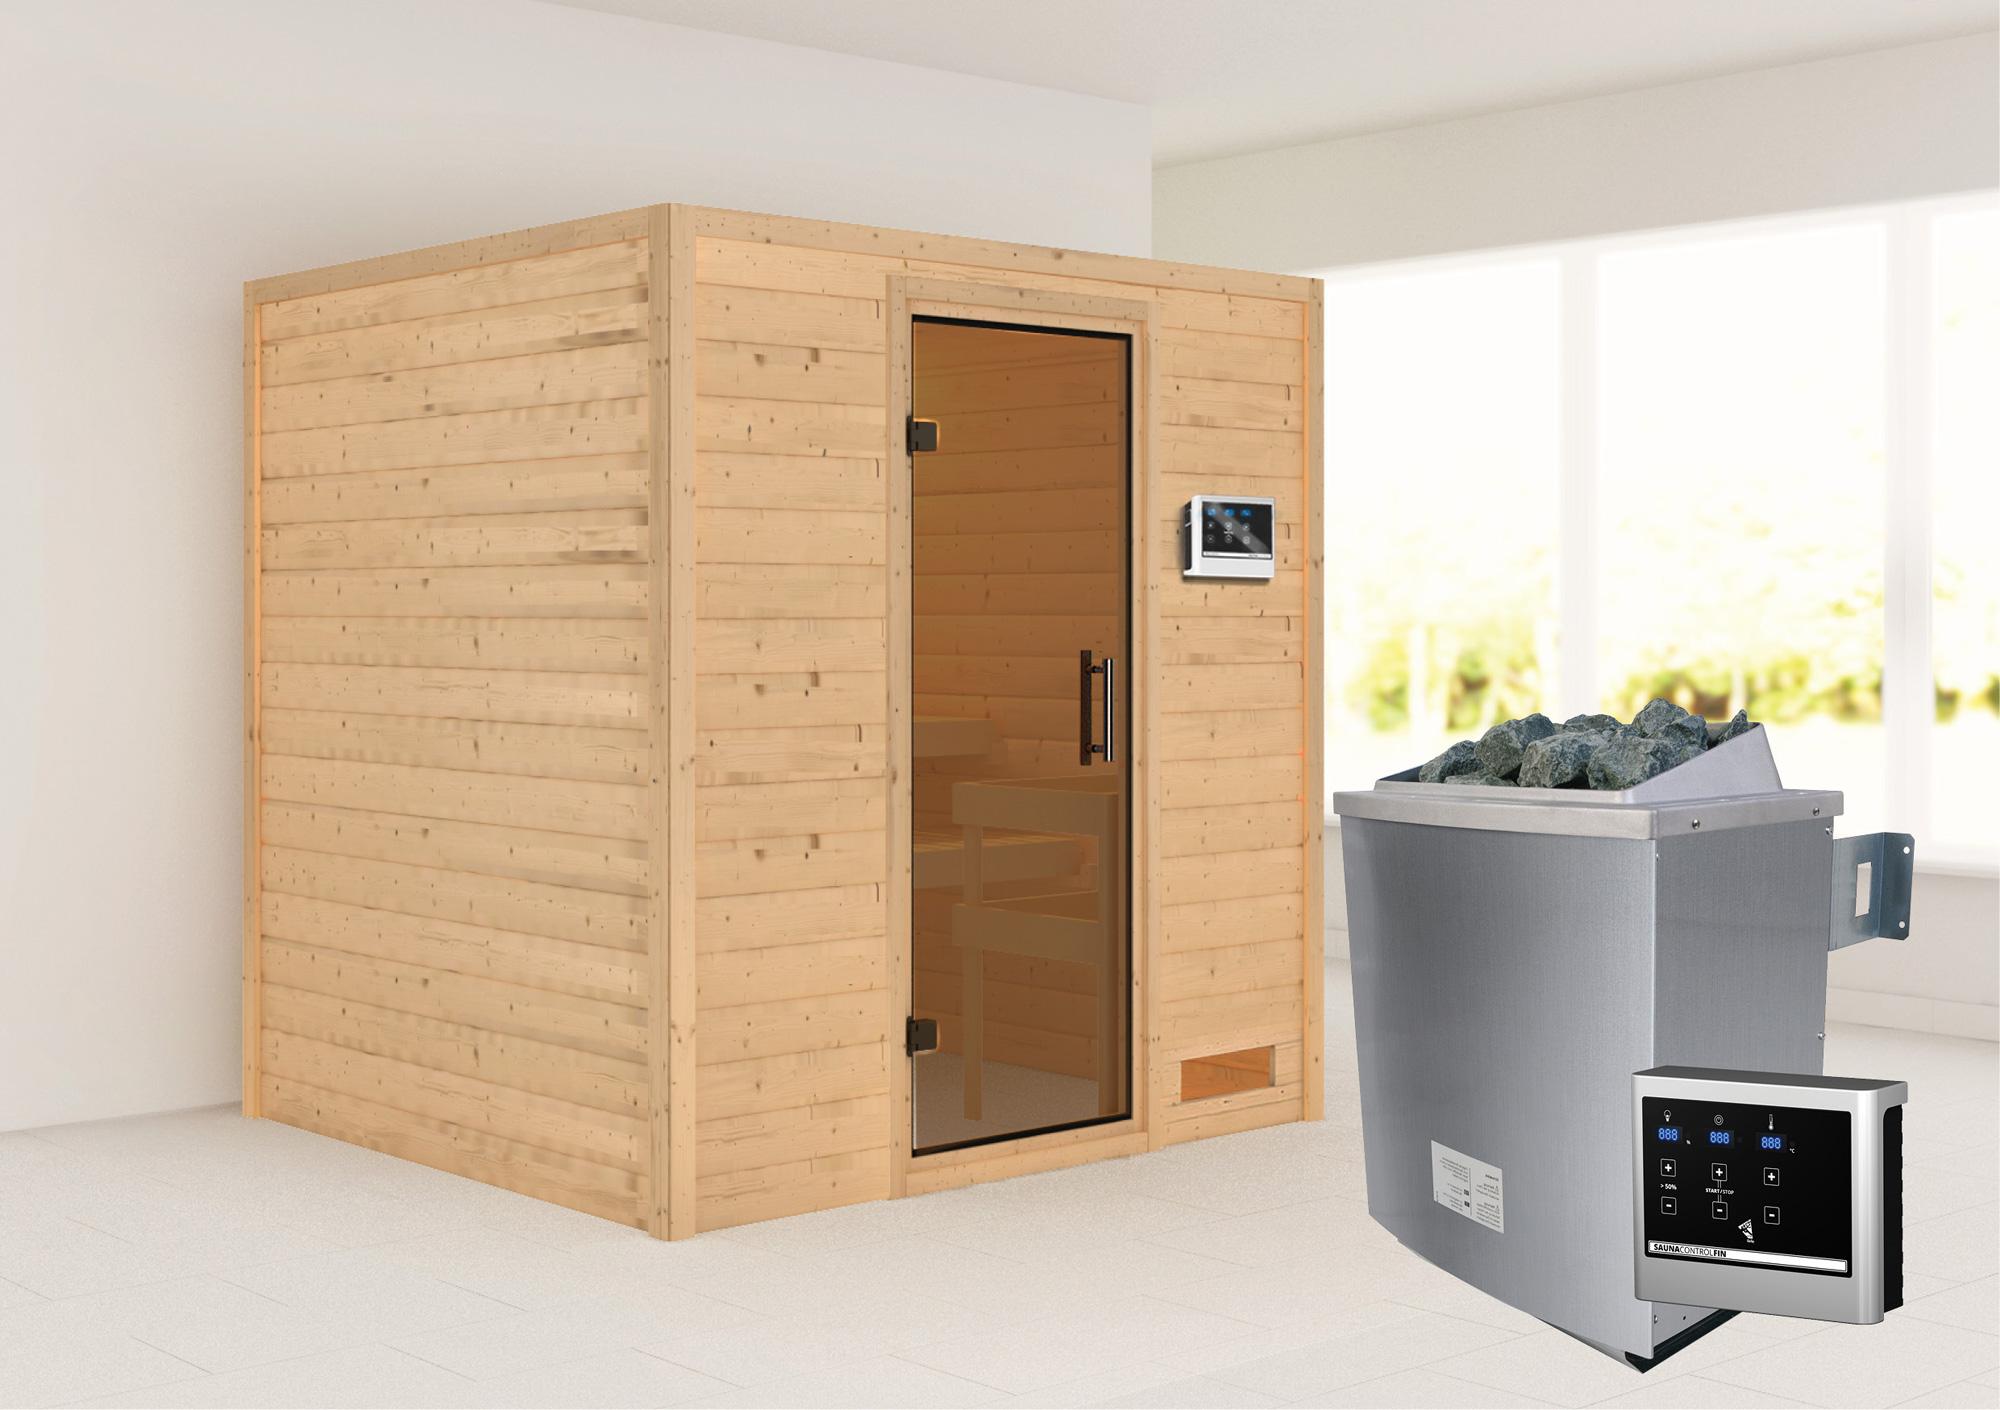 Woodfeeling Sauna Anja 38mm mit Saunaofen 9 kW extern moderne Tür Bild 1